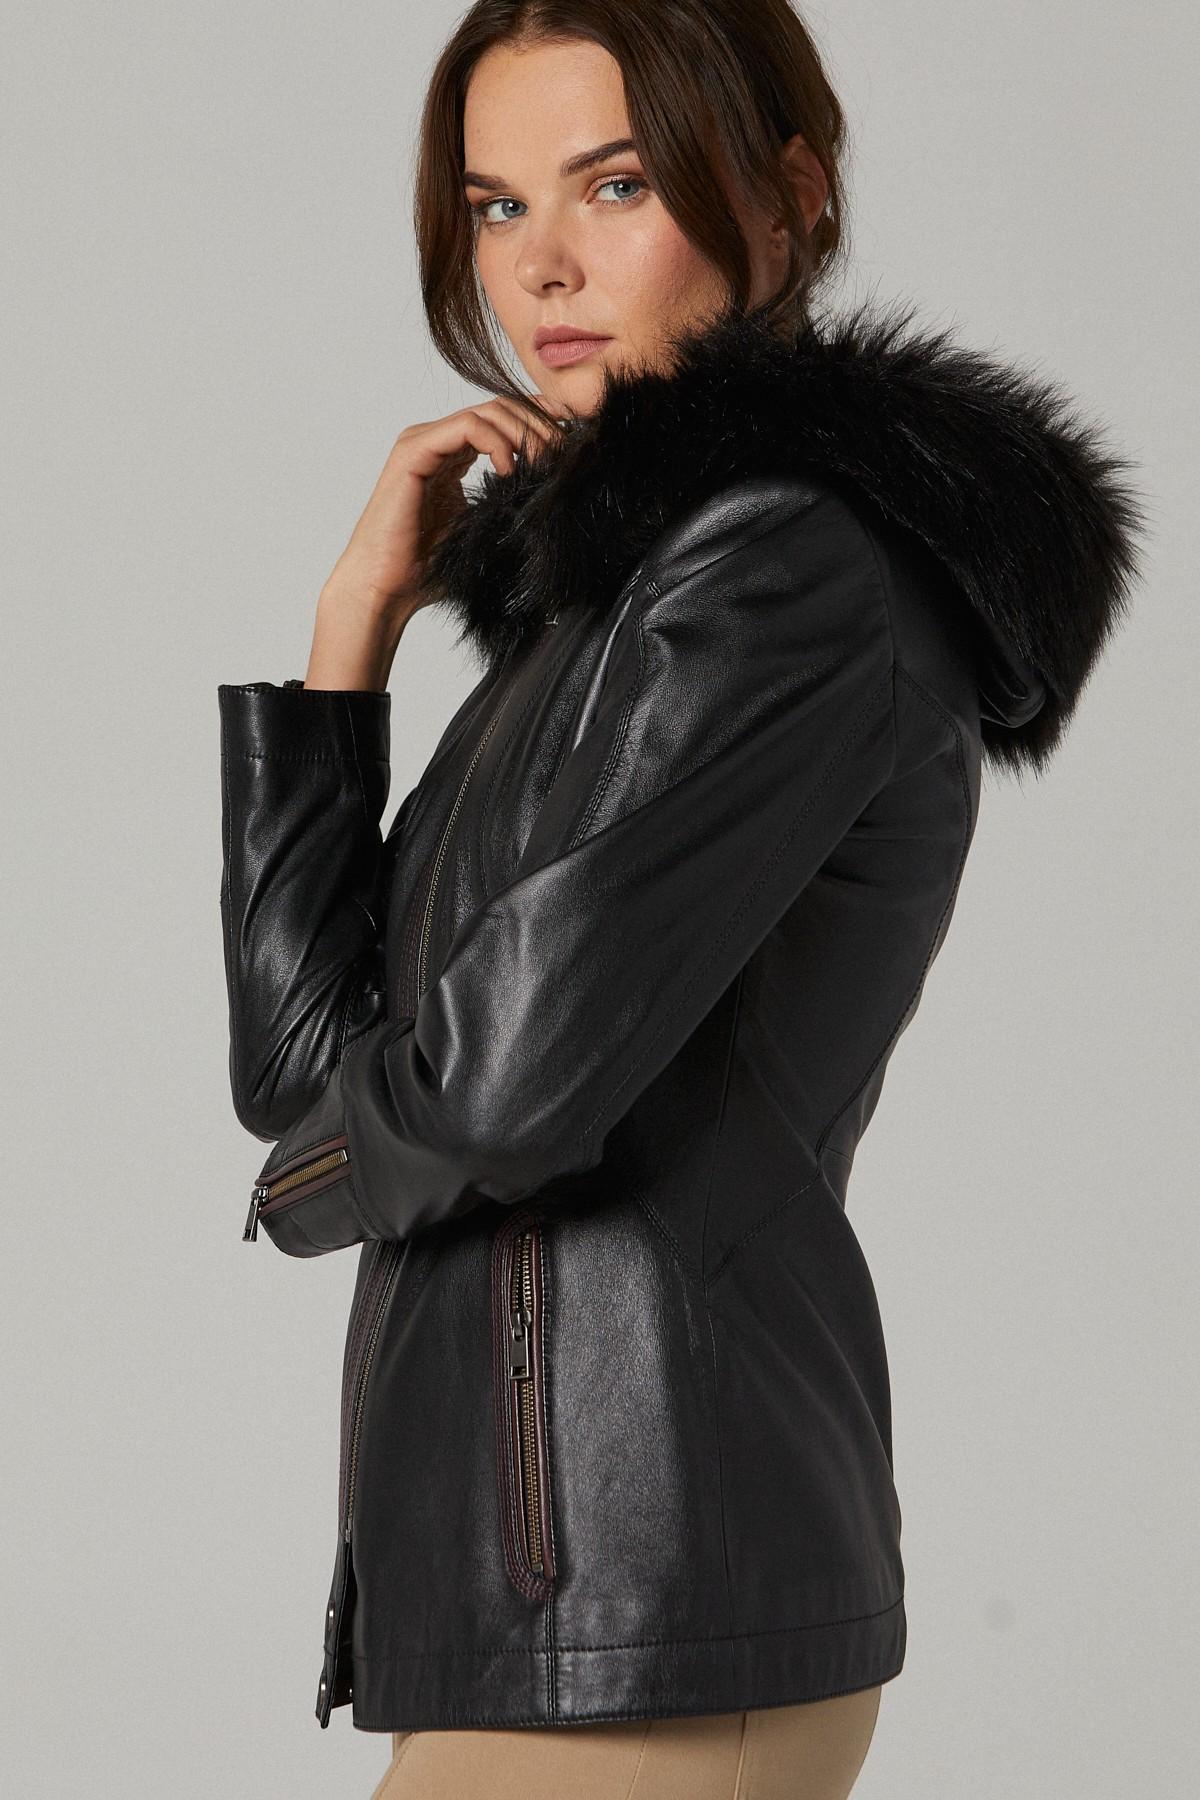 Wilsons Leather Fur Coat